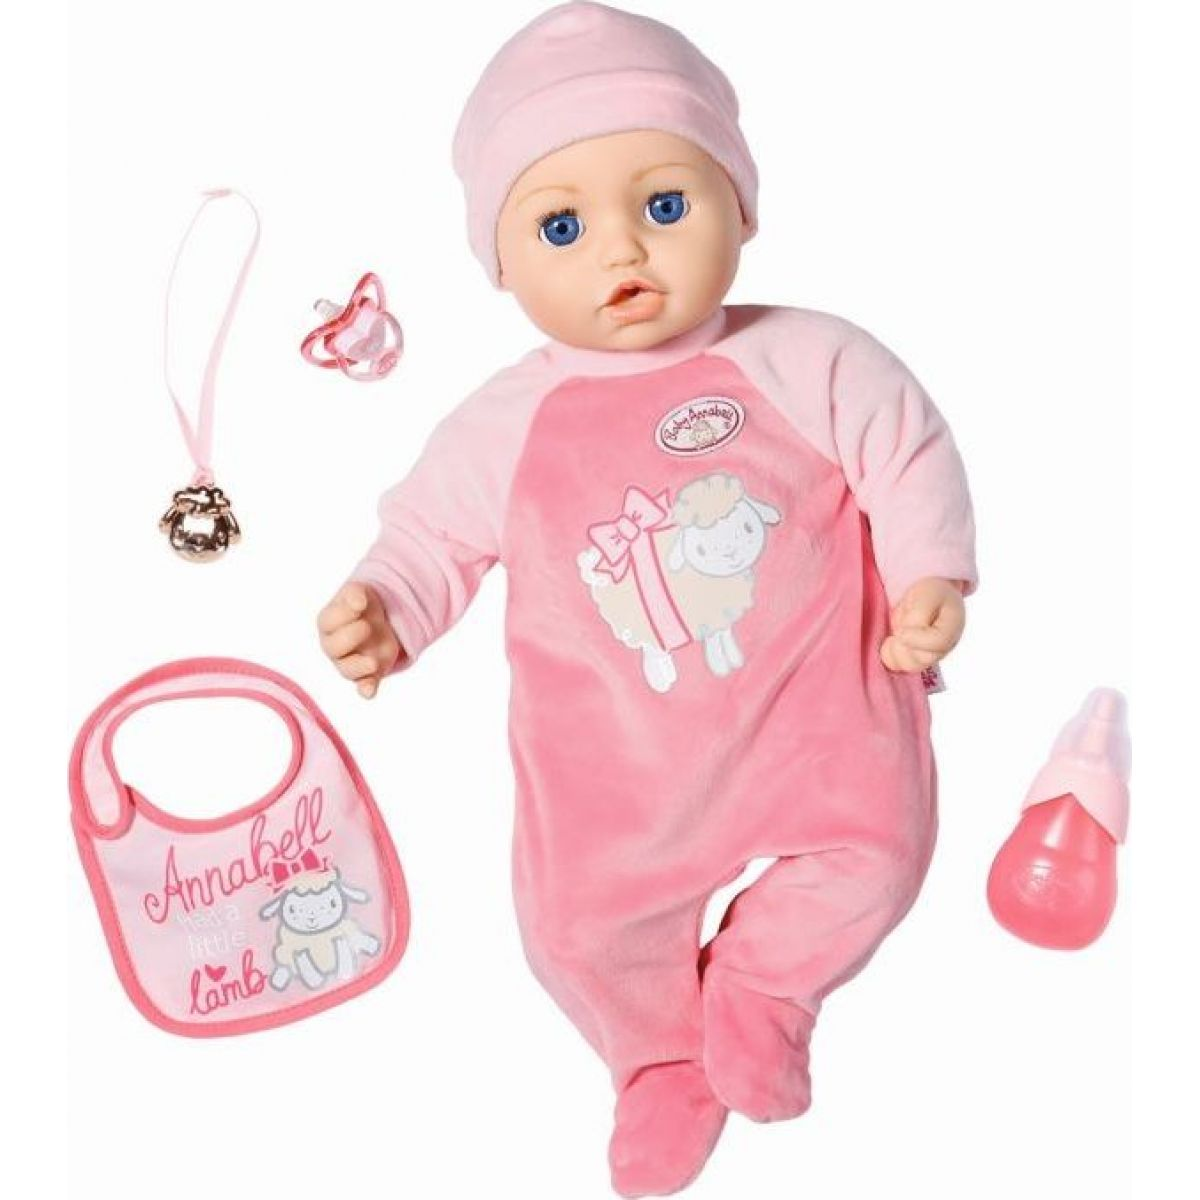 Zapf Creation Baby Annabell Annabell, 43 cm - Poškozený obal